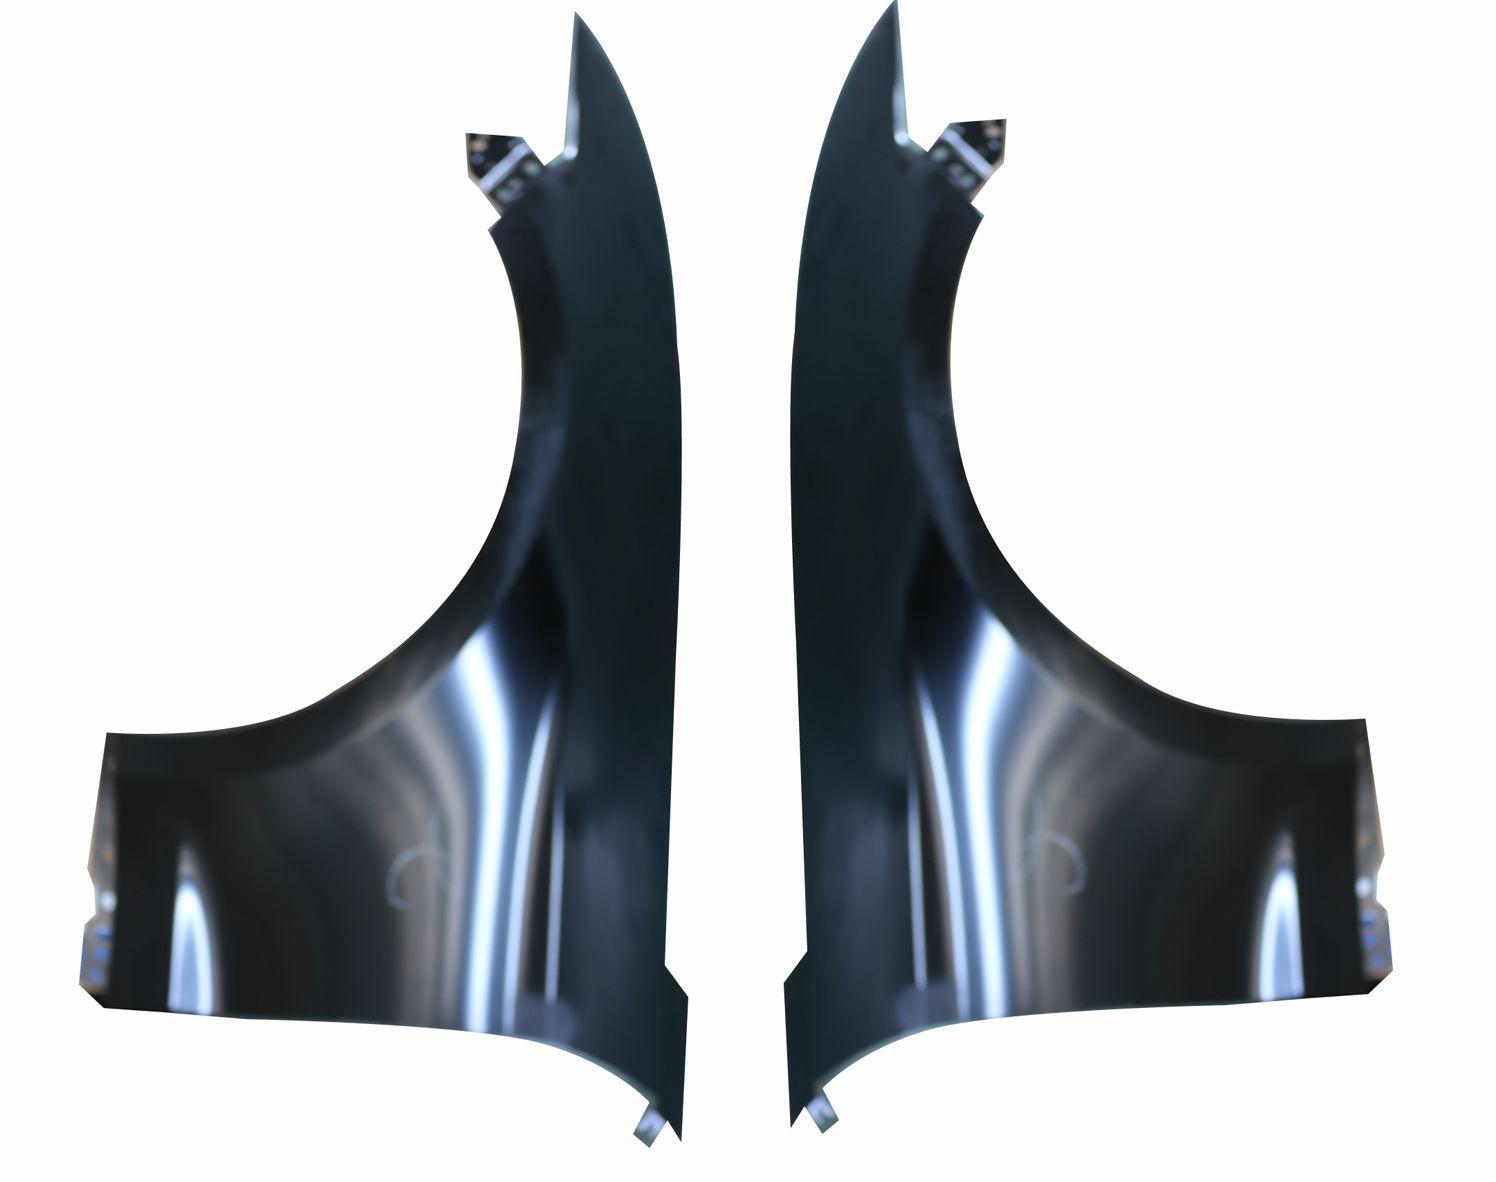 Aftermarket front fender for Mustang 2015 FR3Z16005A FR3Z16006A